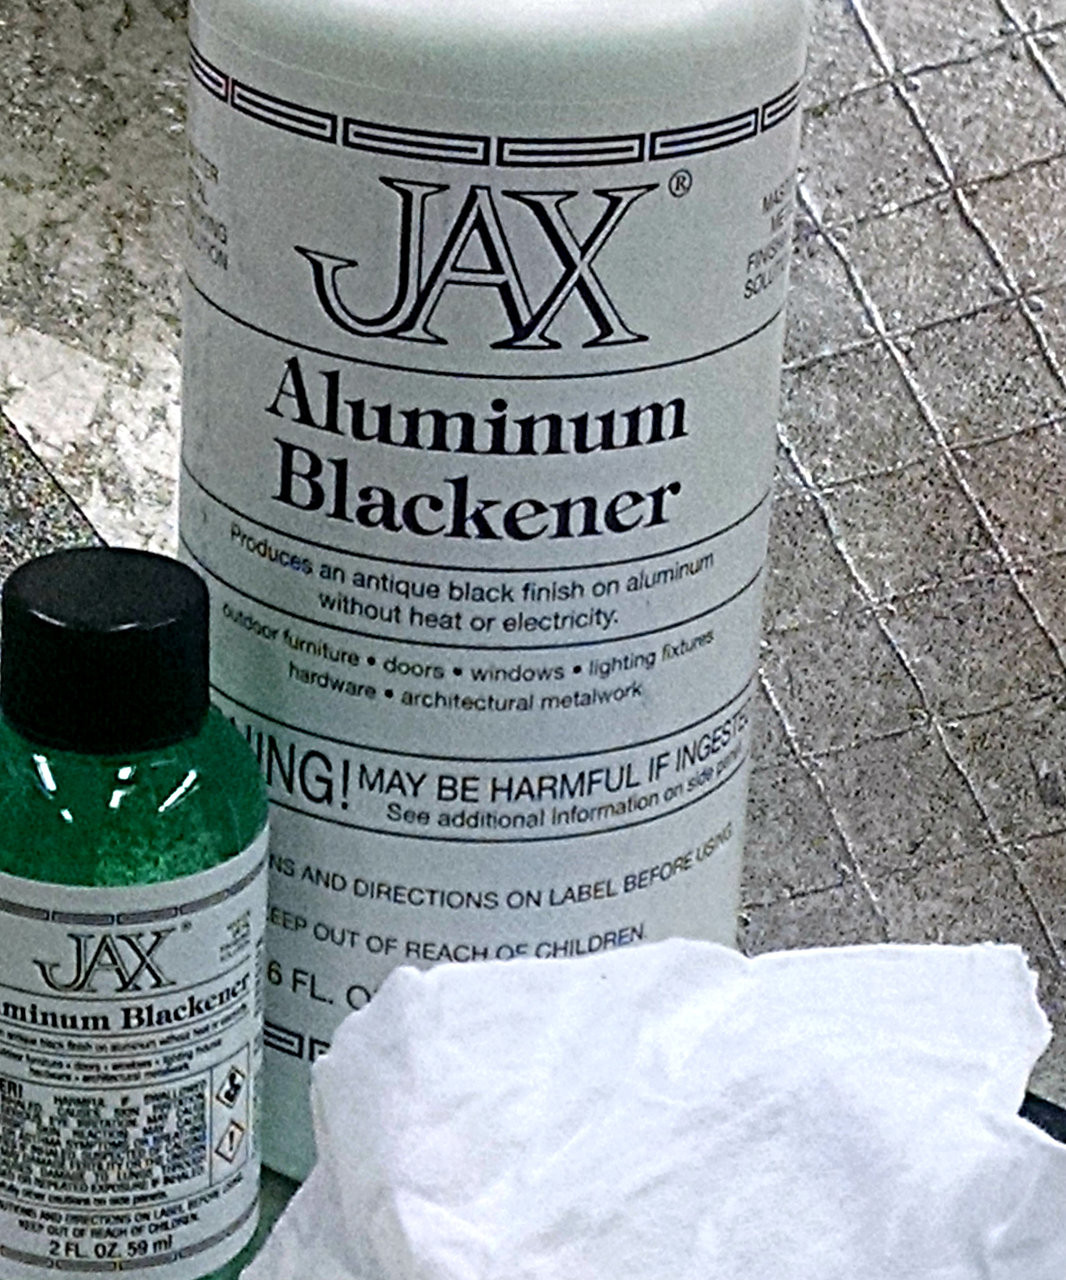 Aluminum Blackener  on Aluminum  over black ground.